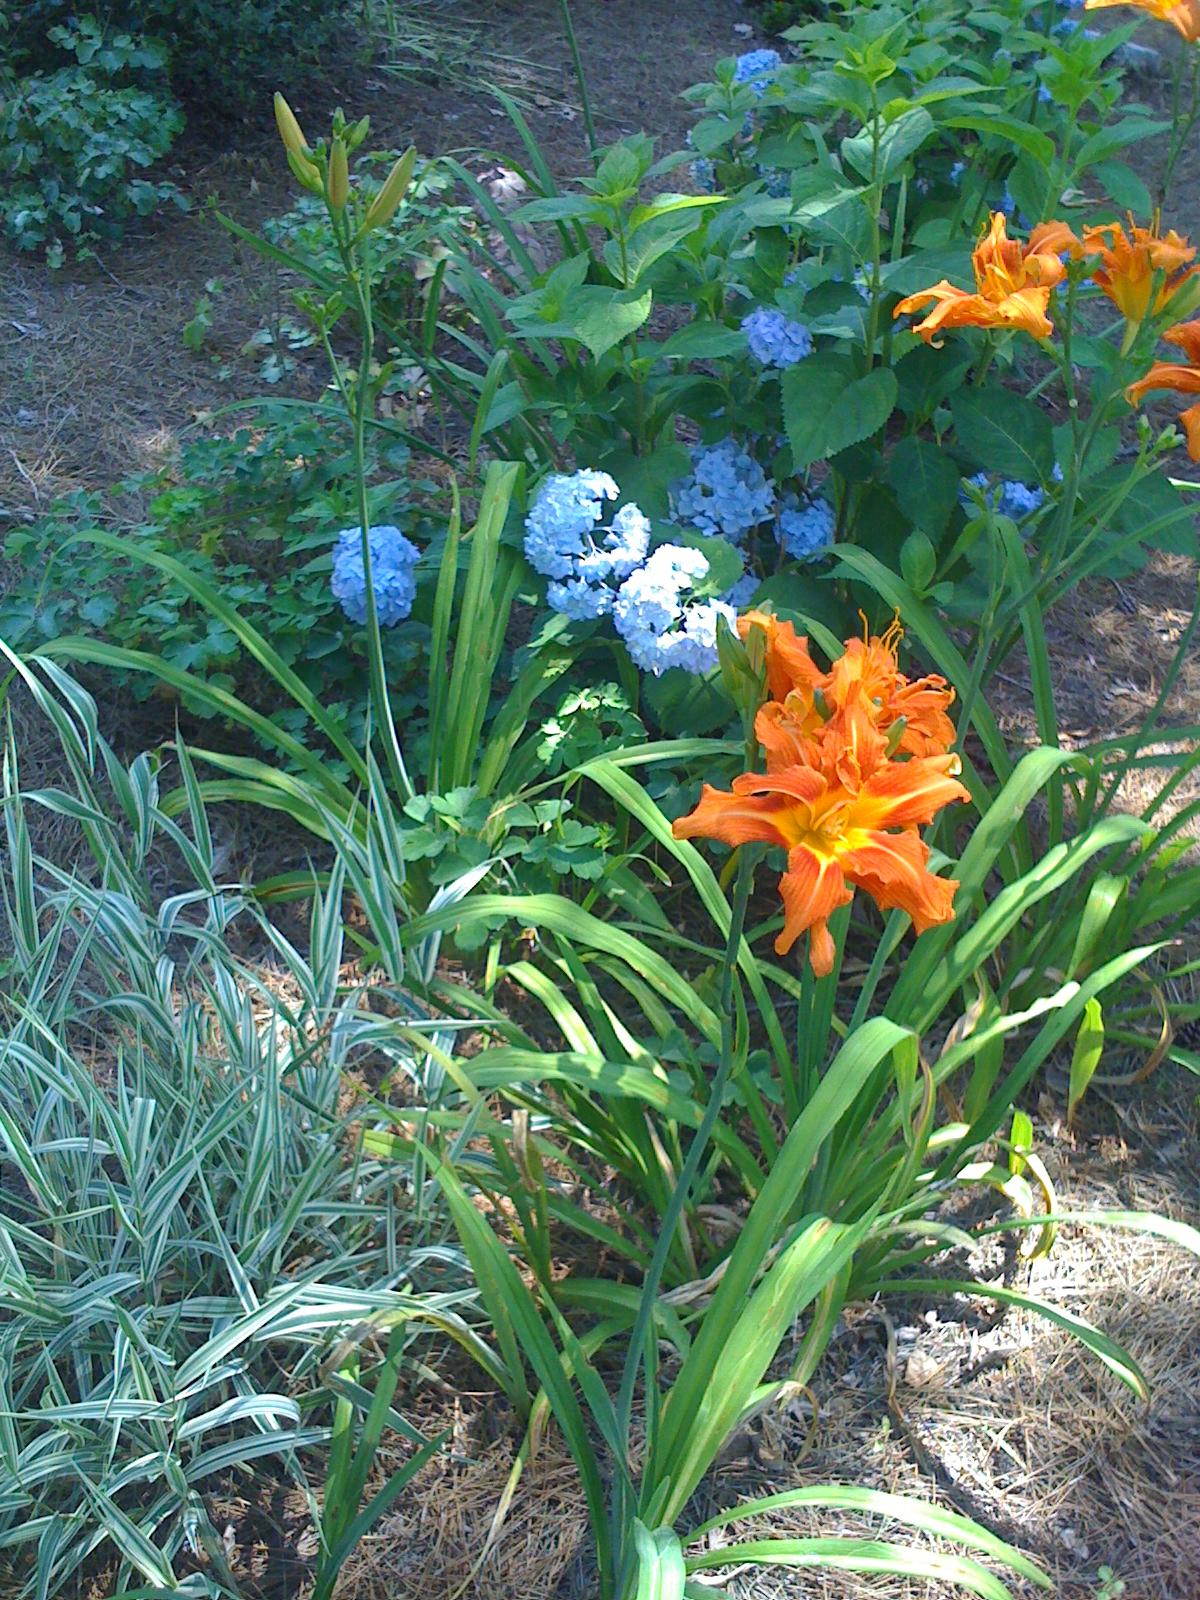 The orange daylily pops in front of the blue hydrangea (Endless Summer Hydrangea macrophylla). (Debbie Neese garden, Biltmore Lake.)